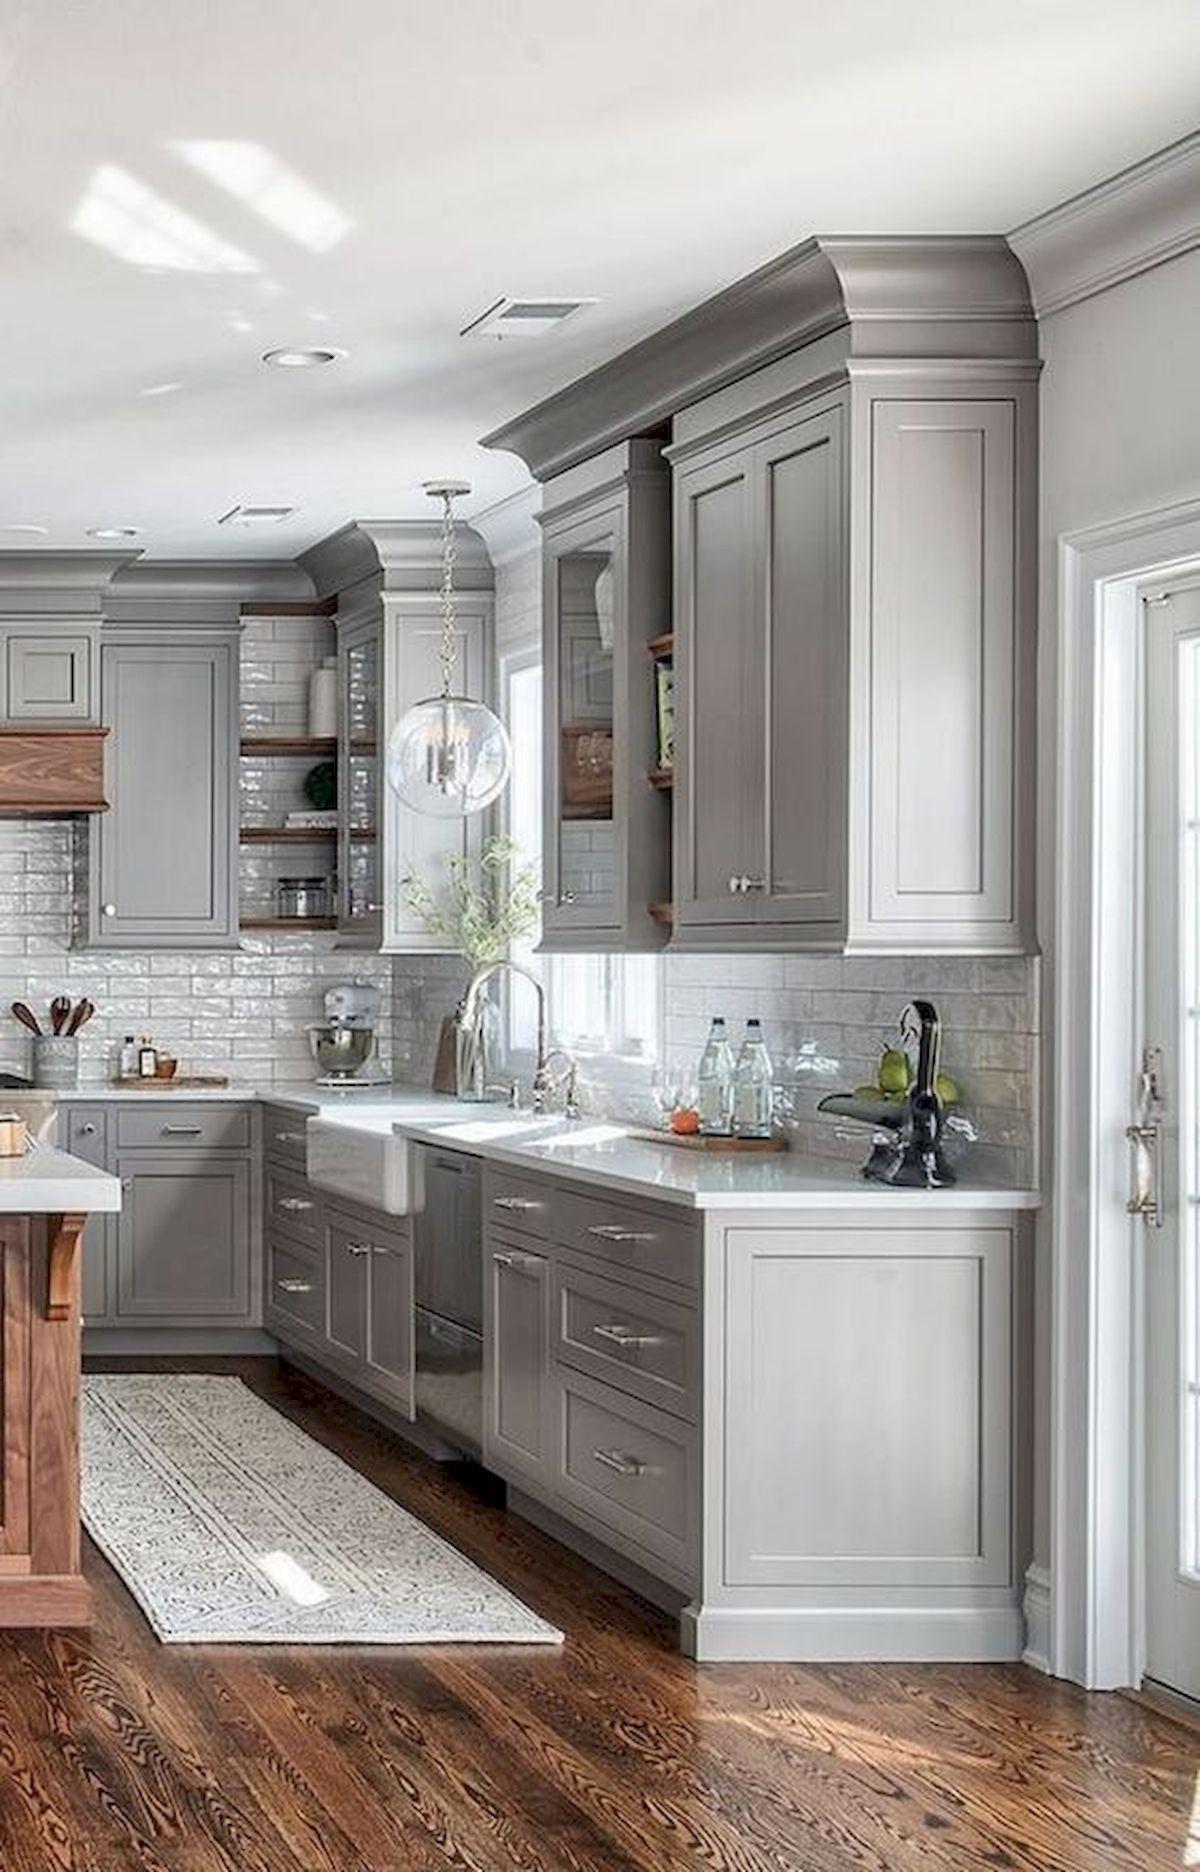 45 Easy Kitchen Decor and Design Ideas (12)